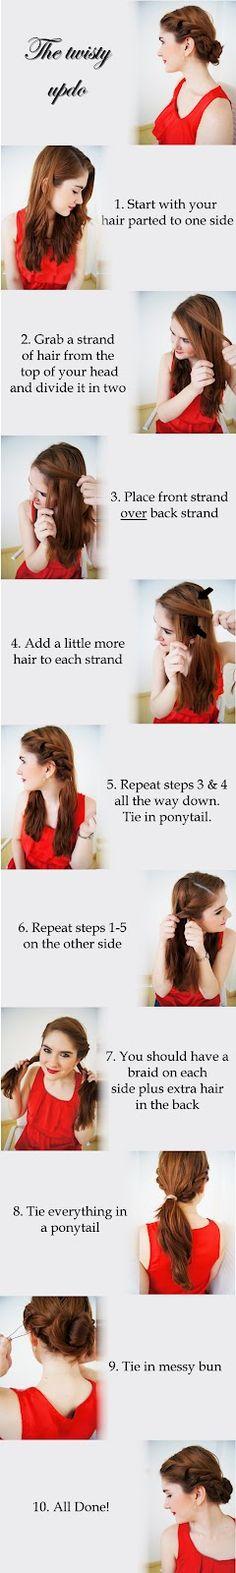 Hair Tutorial: The Twisty Updo